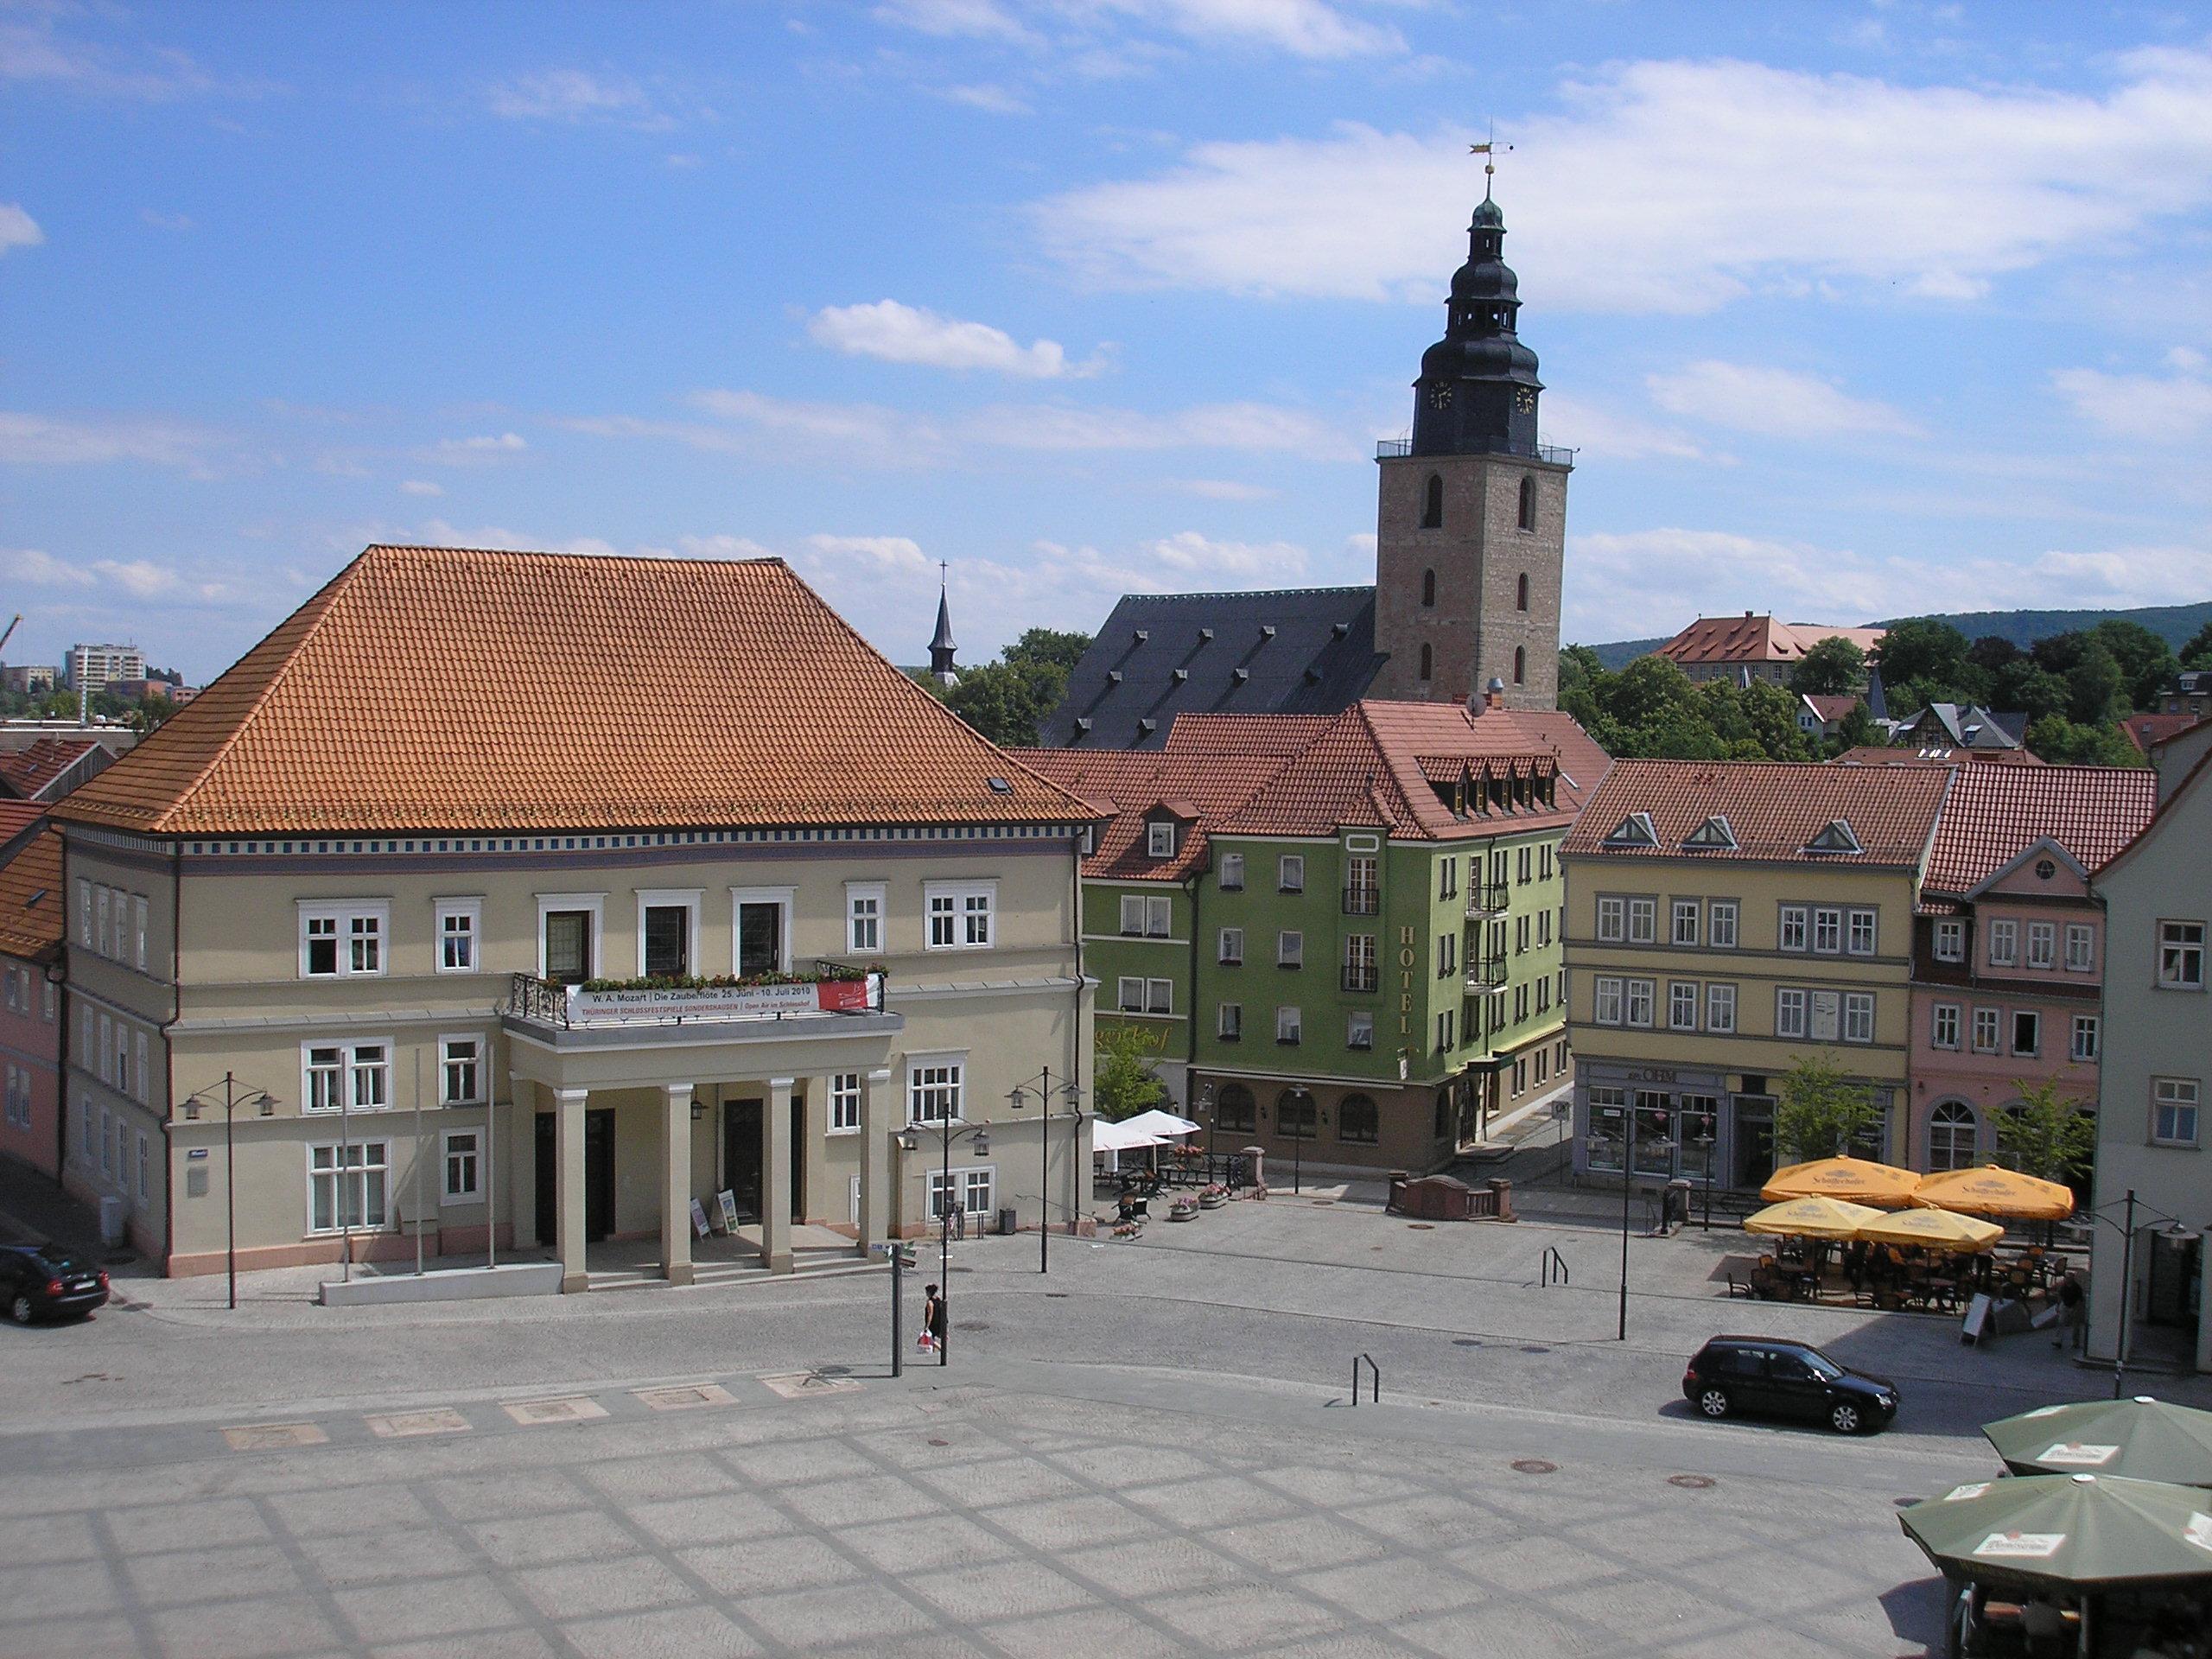 File:Markt Sondershausen.JPG